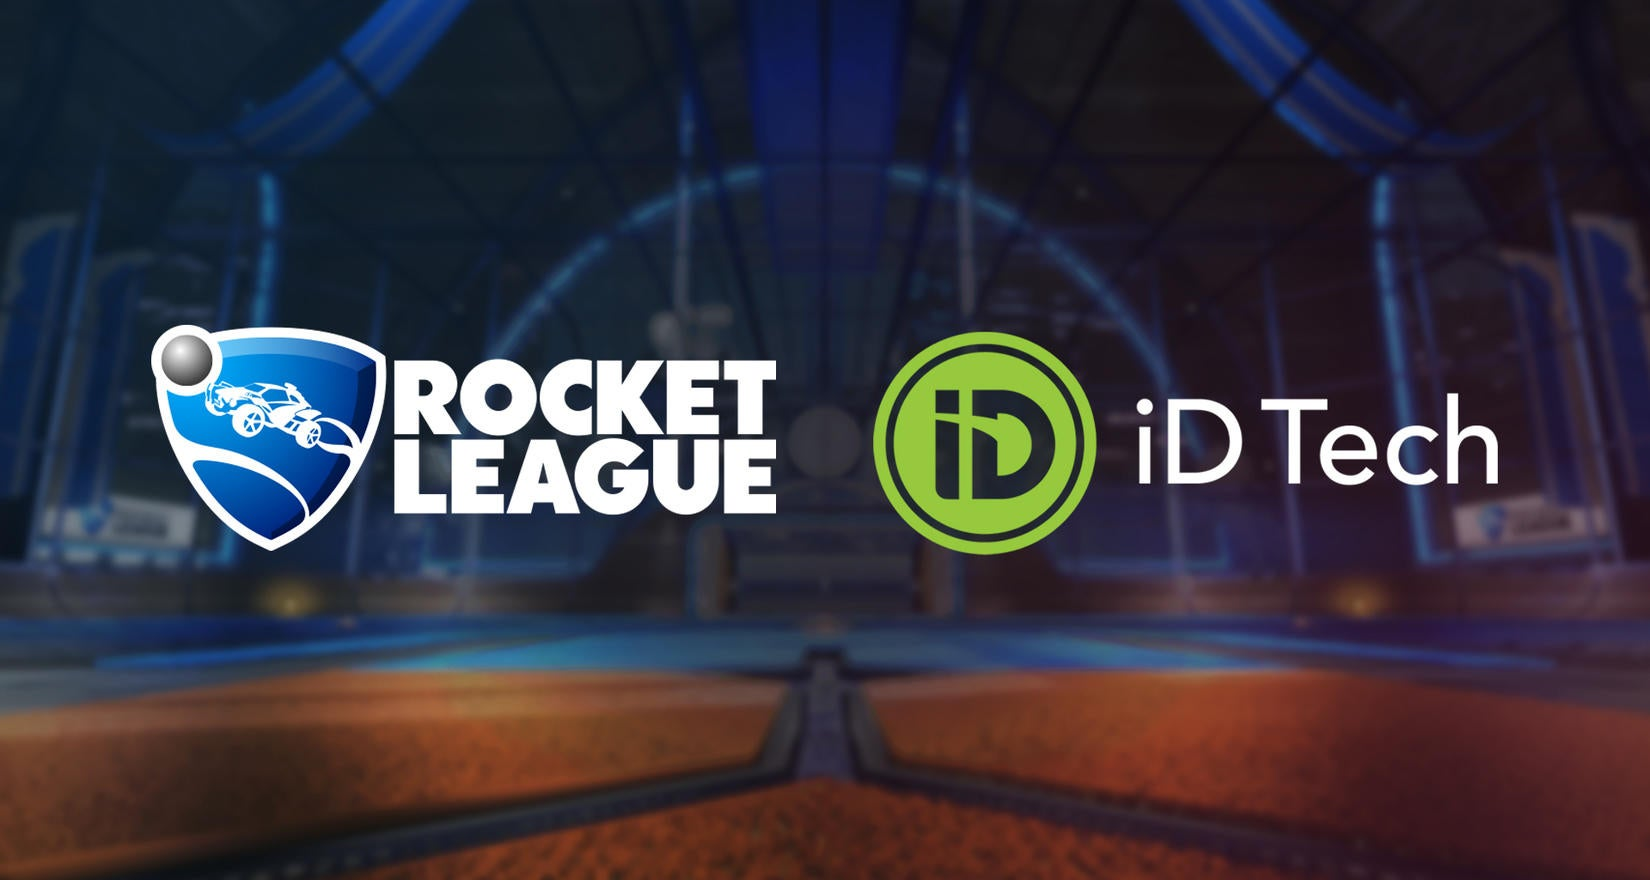 Rocket League Joins iD Tech's Summer Camp Program Image